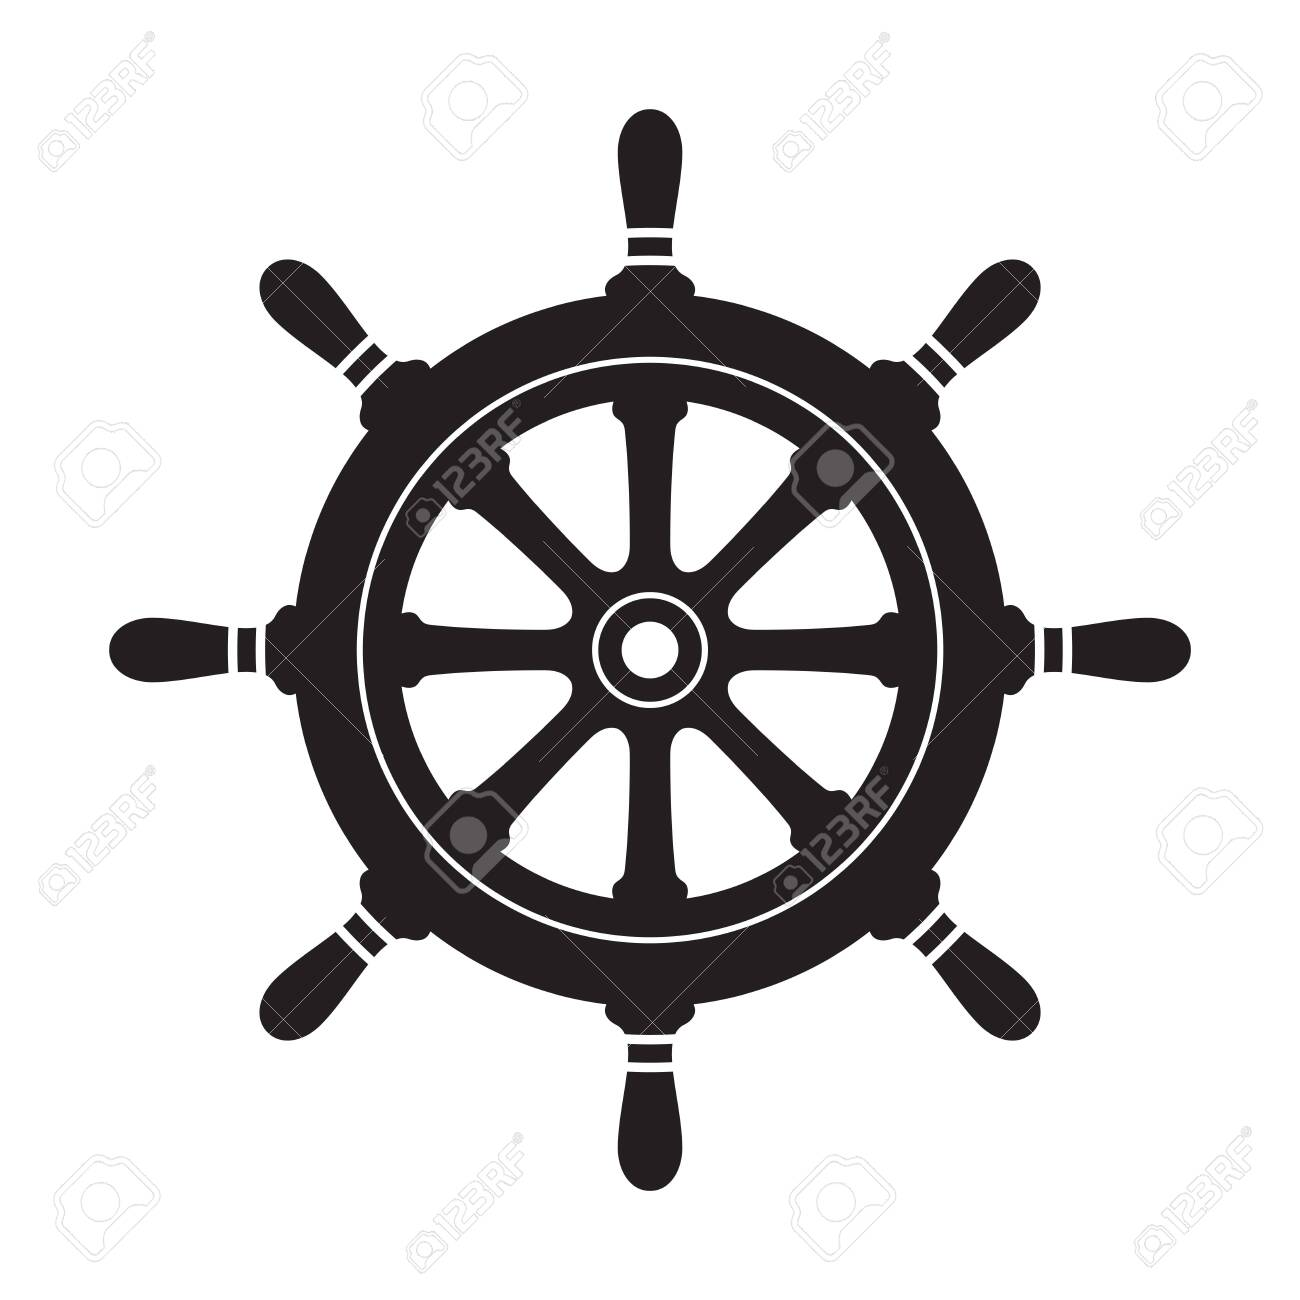 Helm Anchor vector icon logo pirate Nautical maritime ocean sea boat illustration - 135683252